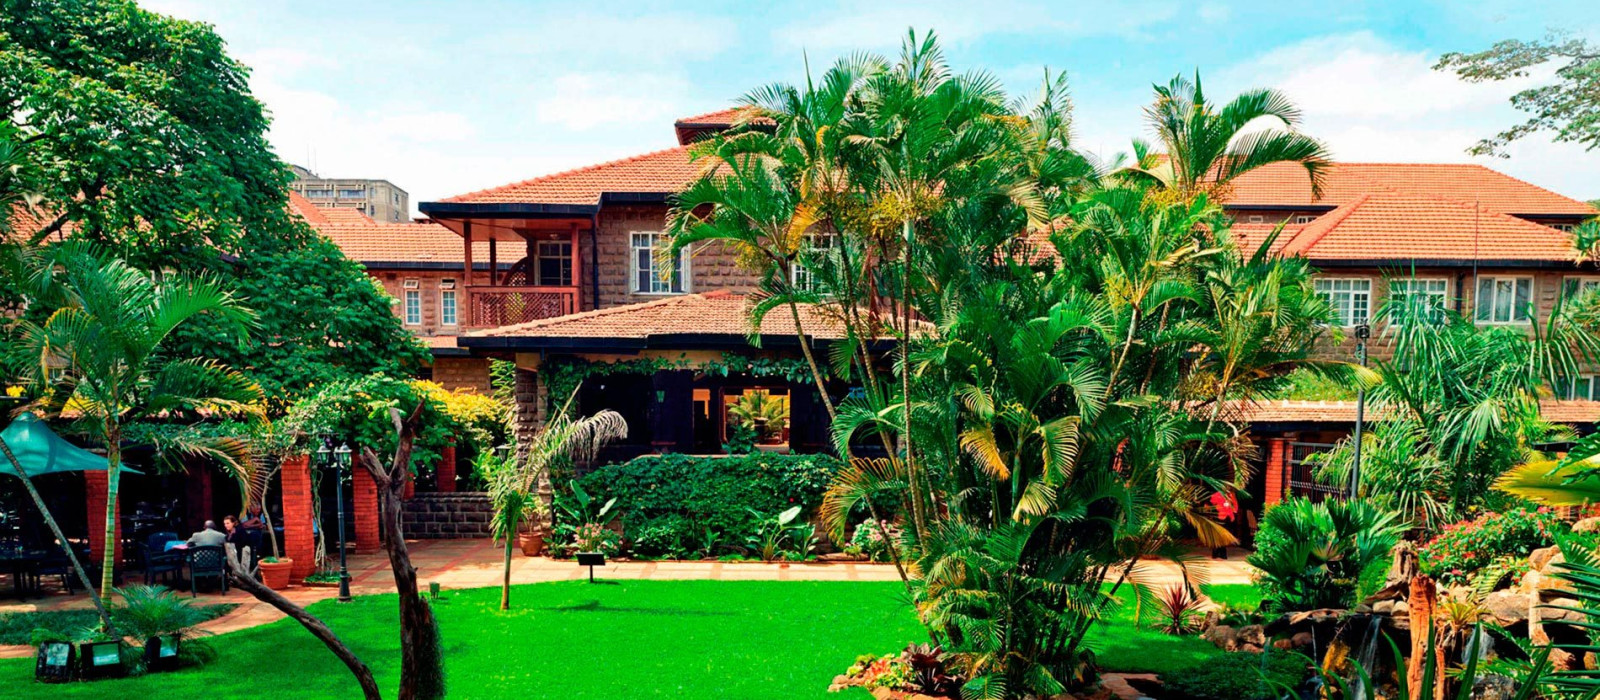 Hotel Fairview  Kenia